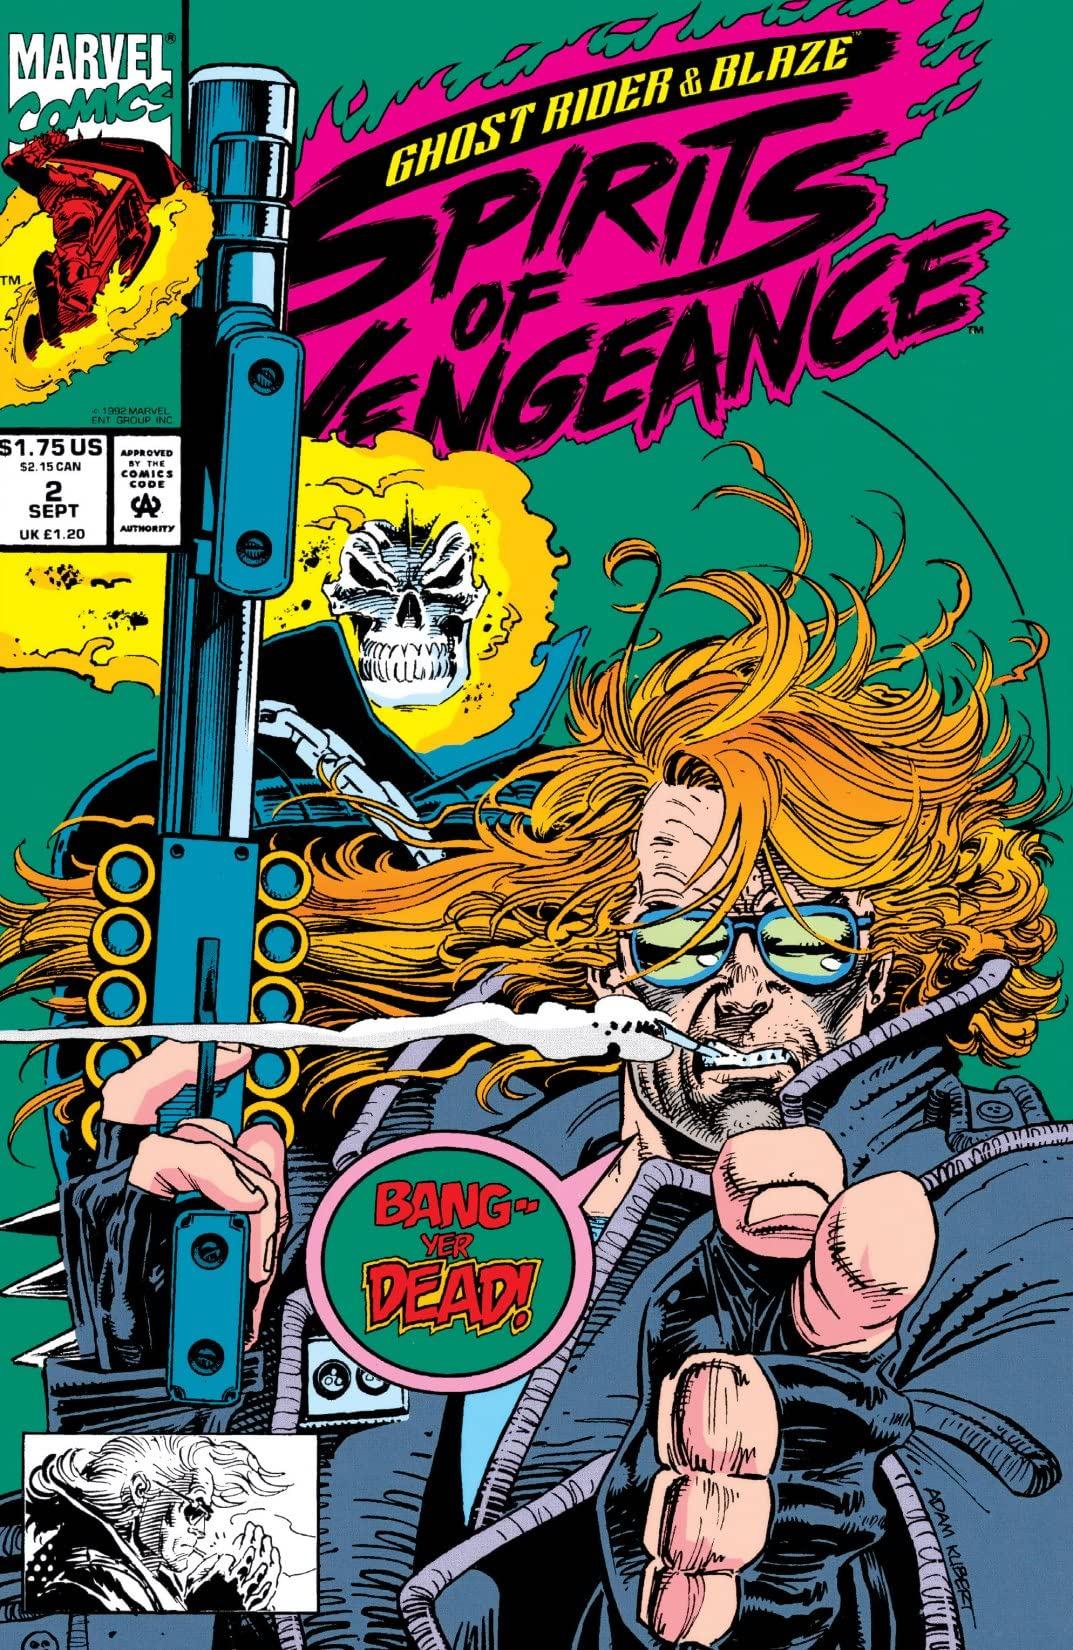 Ghost Rider & Blaze: Spirits of Vengeance 2